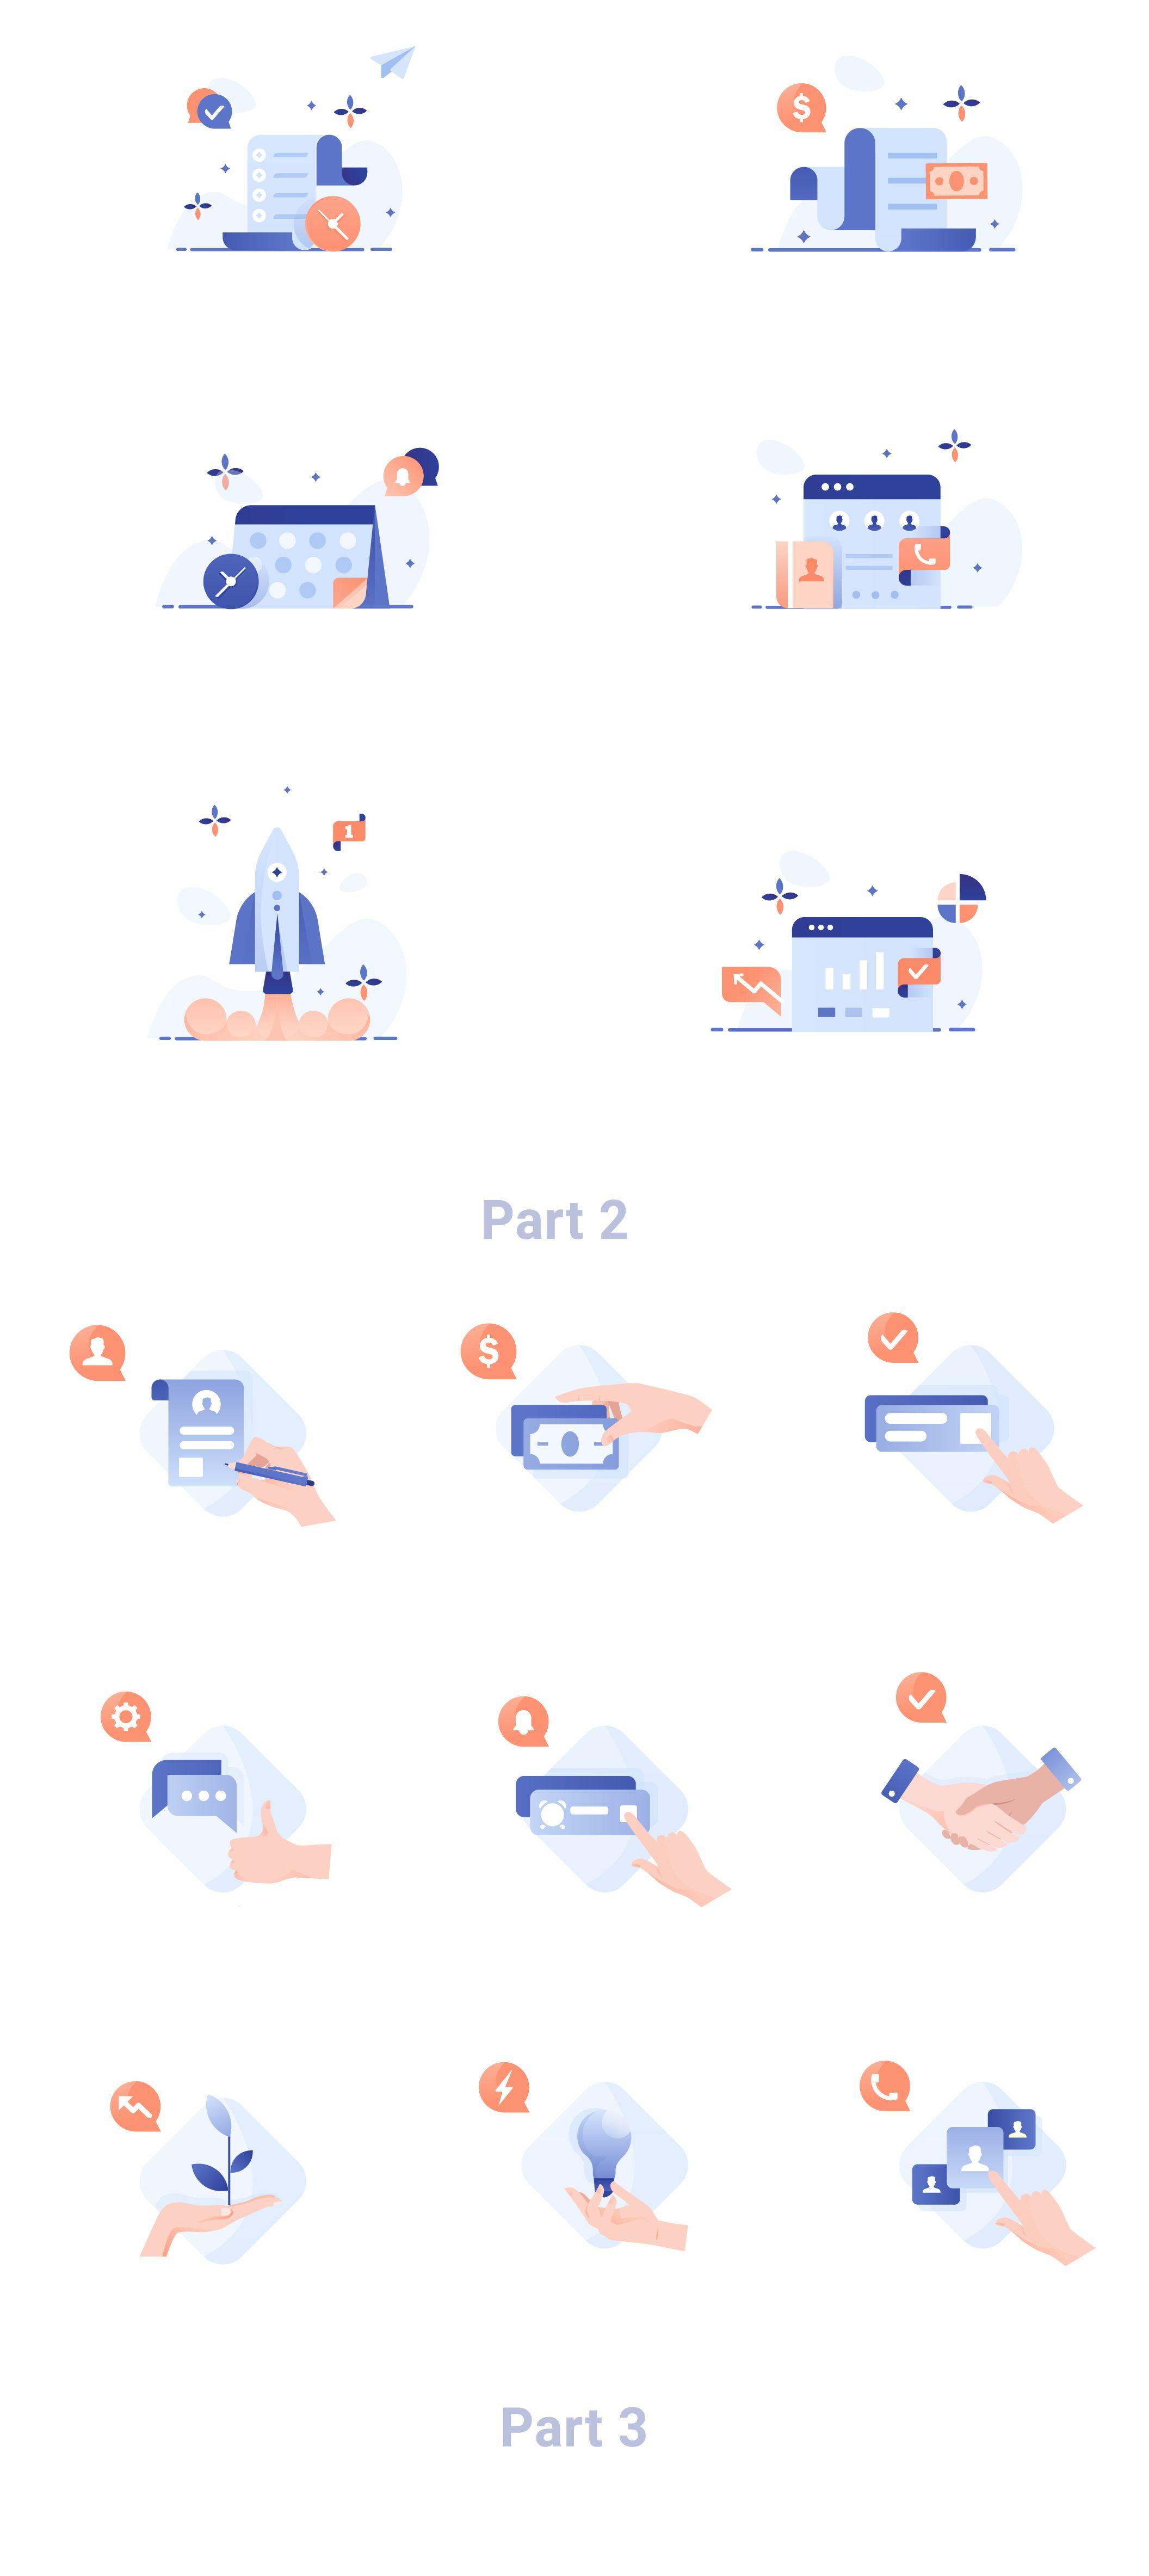 Business Illustration Pack Illustrations On Ui8 Icon Design Inspiration Business Illustration Illustration